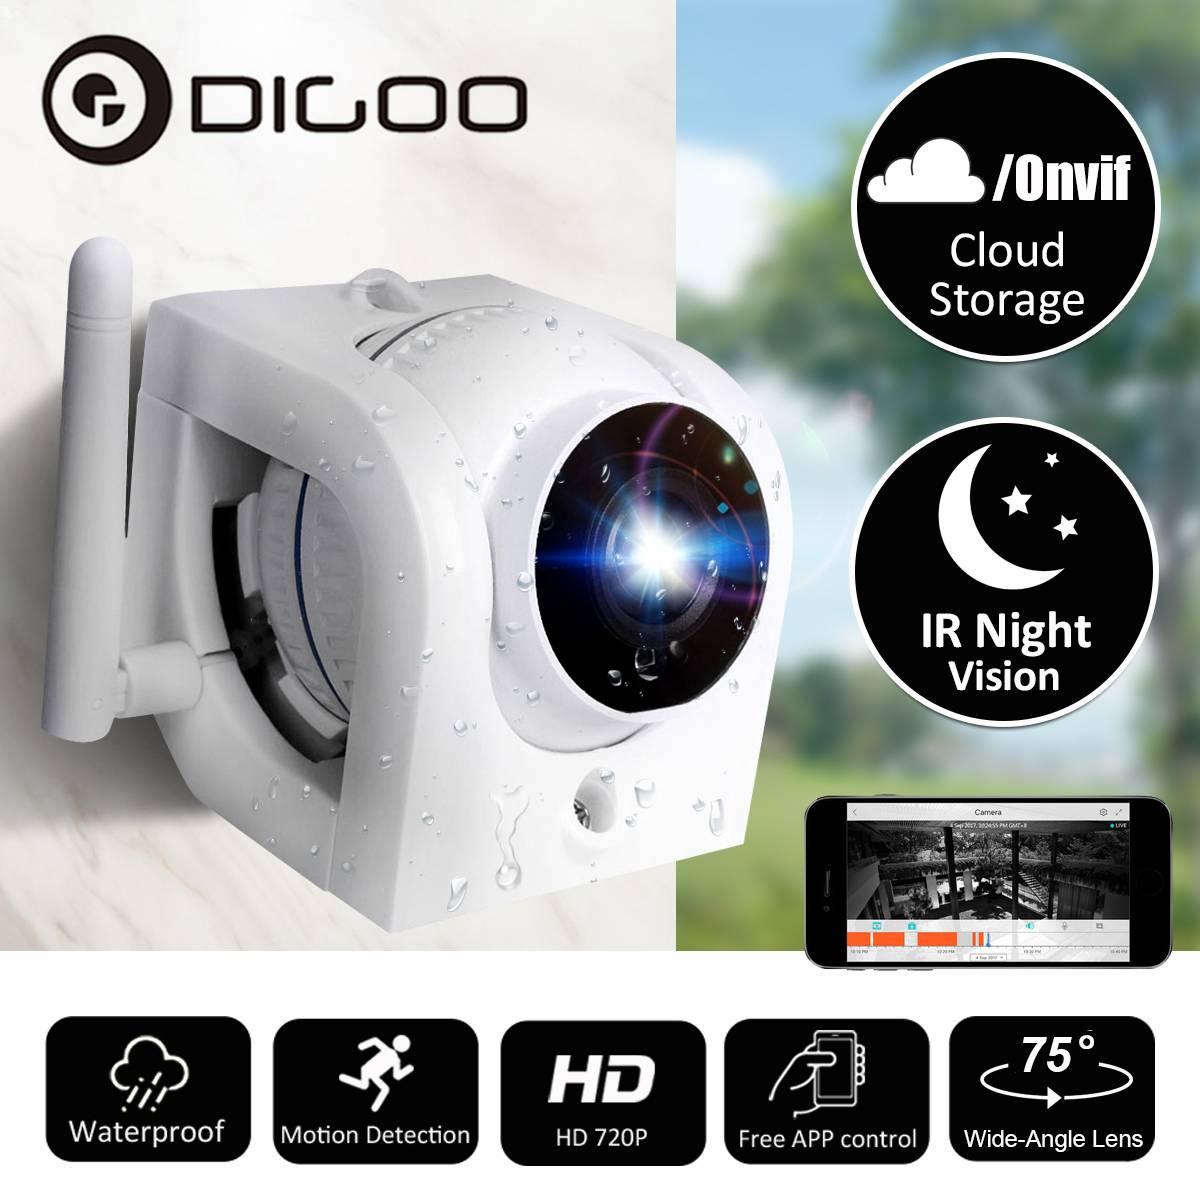 Digoo DG W02f Cloud Storage 3.6mm 720P Waterproof Outdoor WIFI Security IP Camera Motion Detection Alarm Support Onvif Monitor